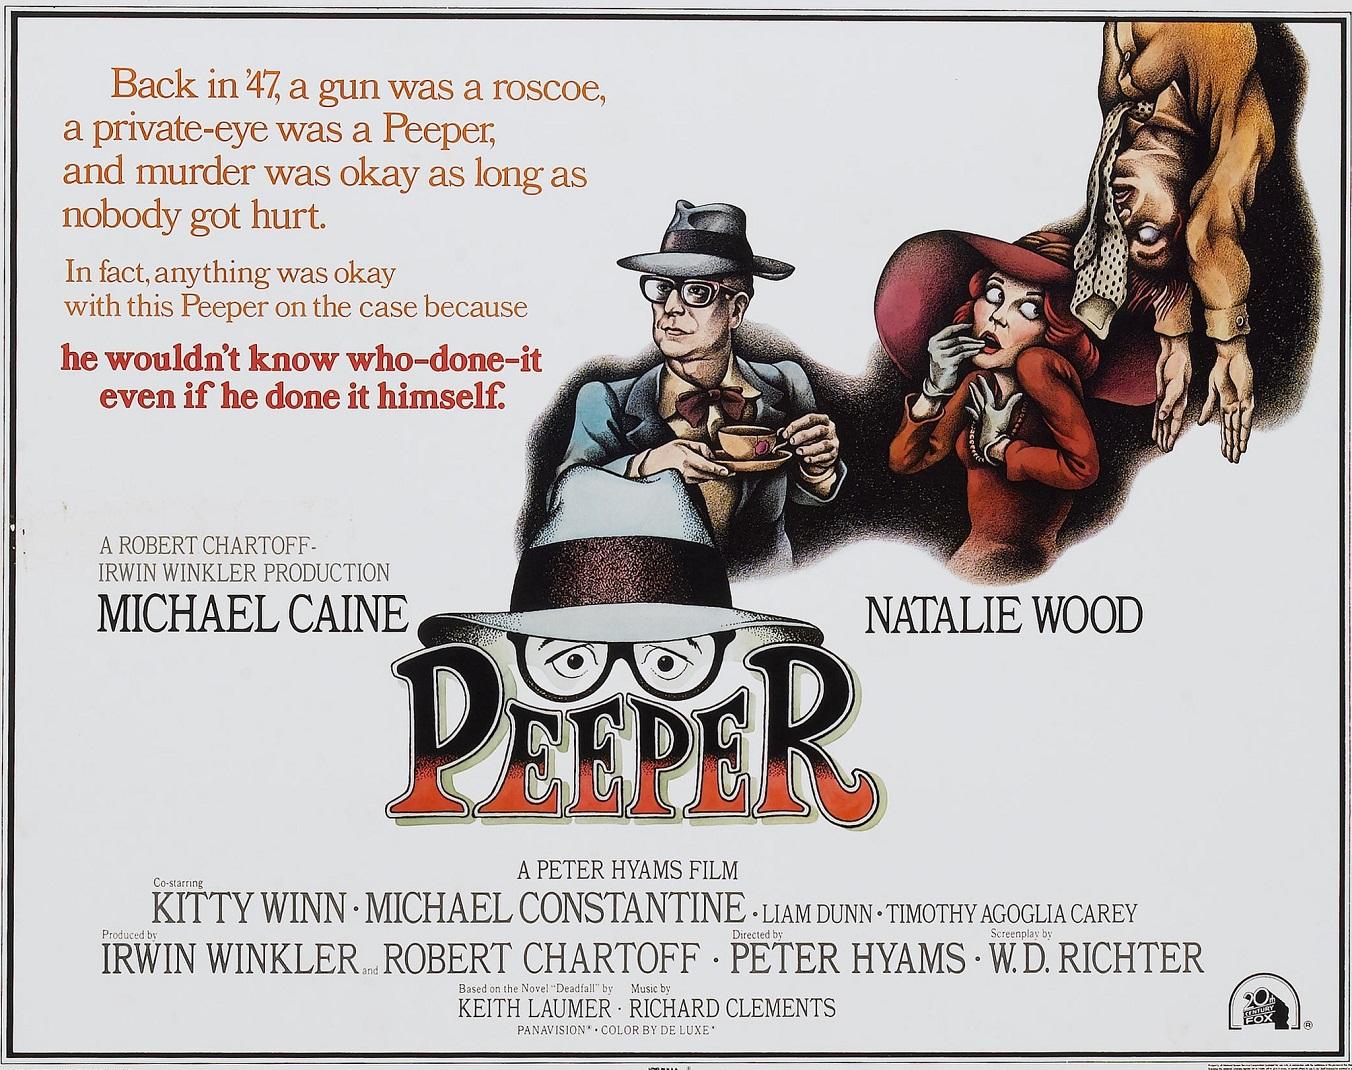 PEEPER (1975) WEB SITE